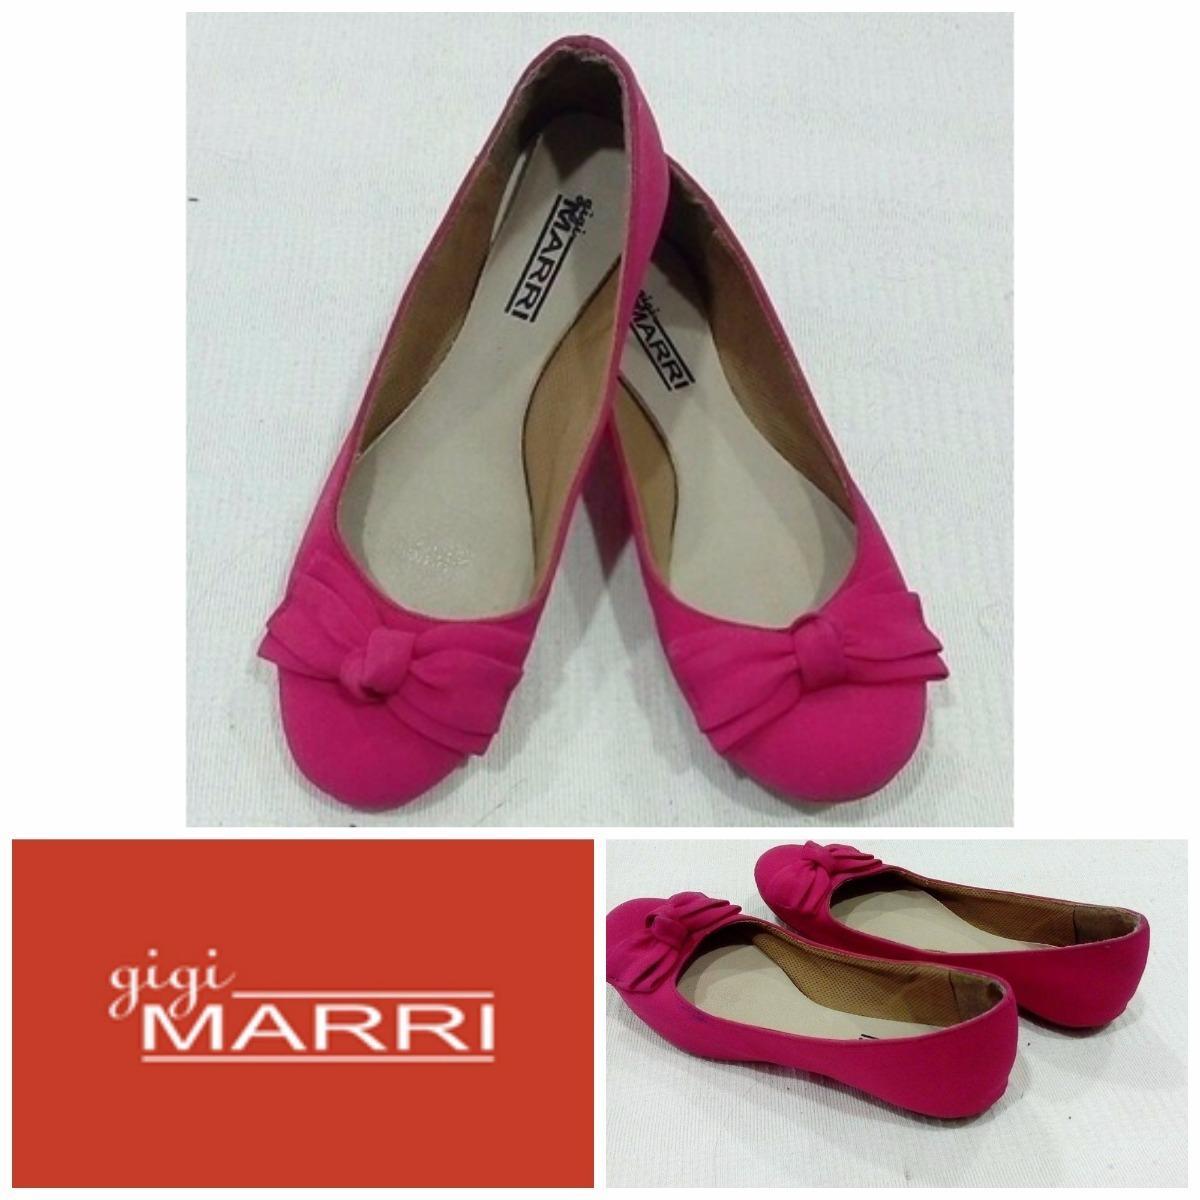 6db5d1a55a Sapatilha Gigi Marri Nº 34 - Semi Nova - Cor Pink - R  16